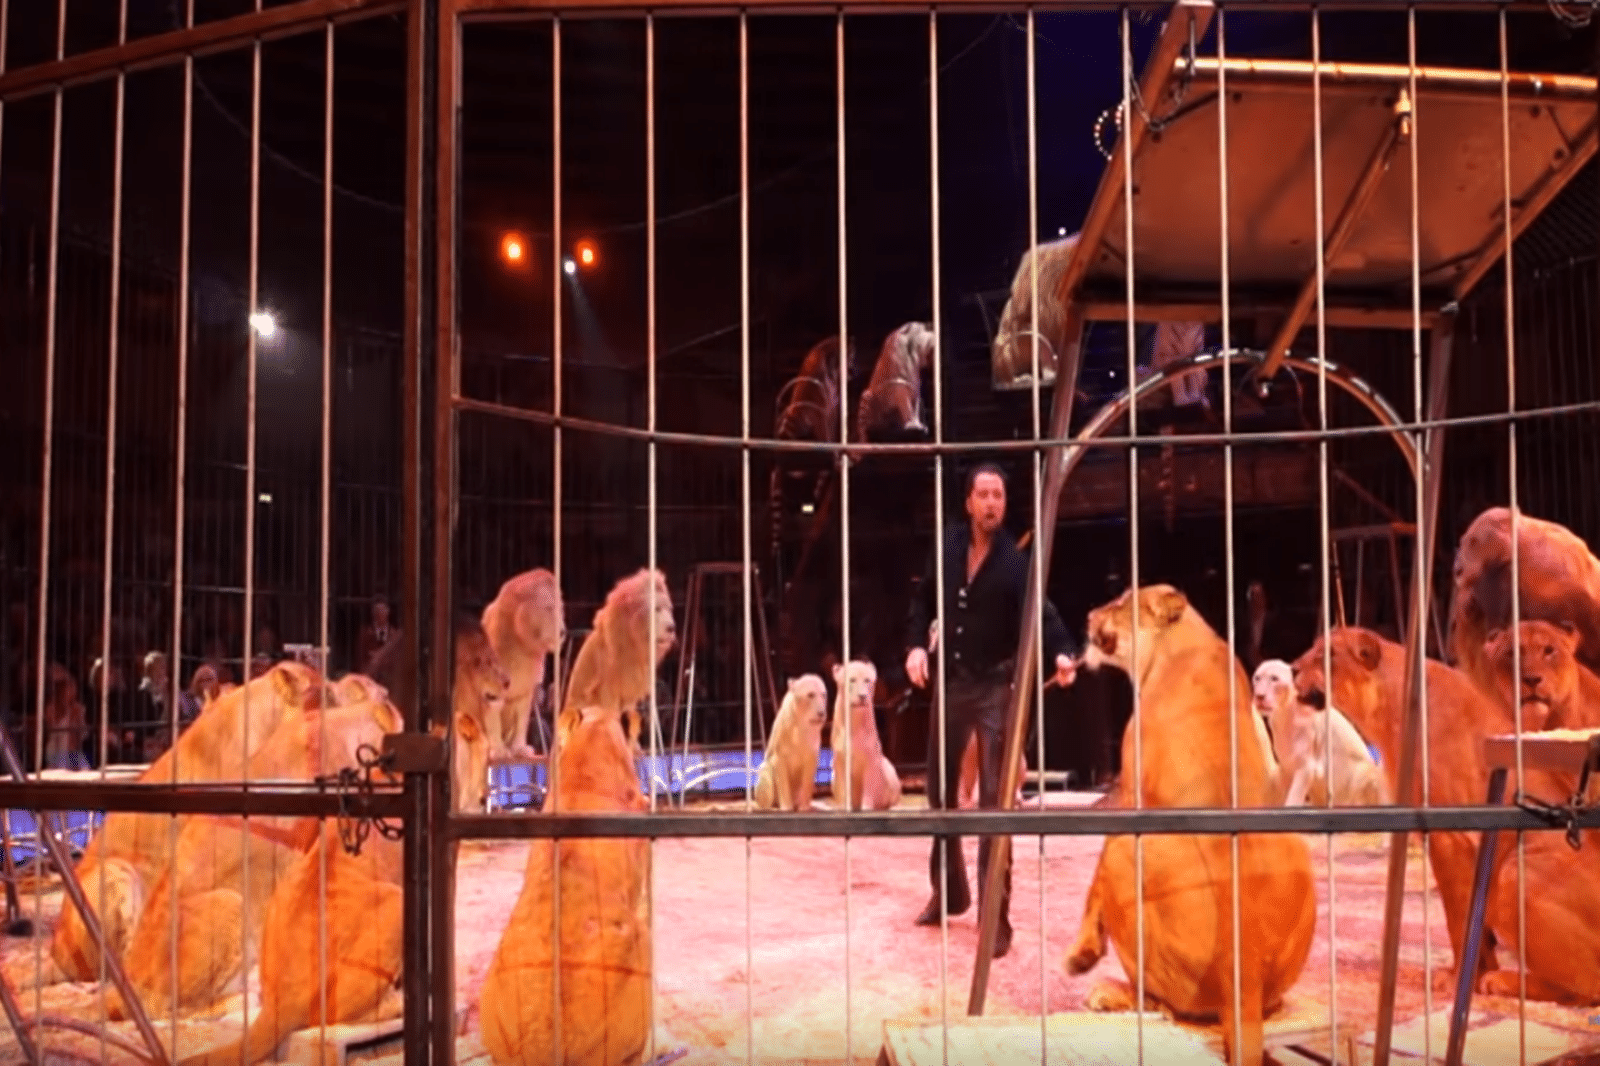 Zirkus Karlsruhe